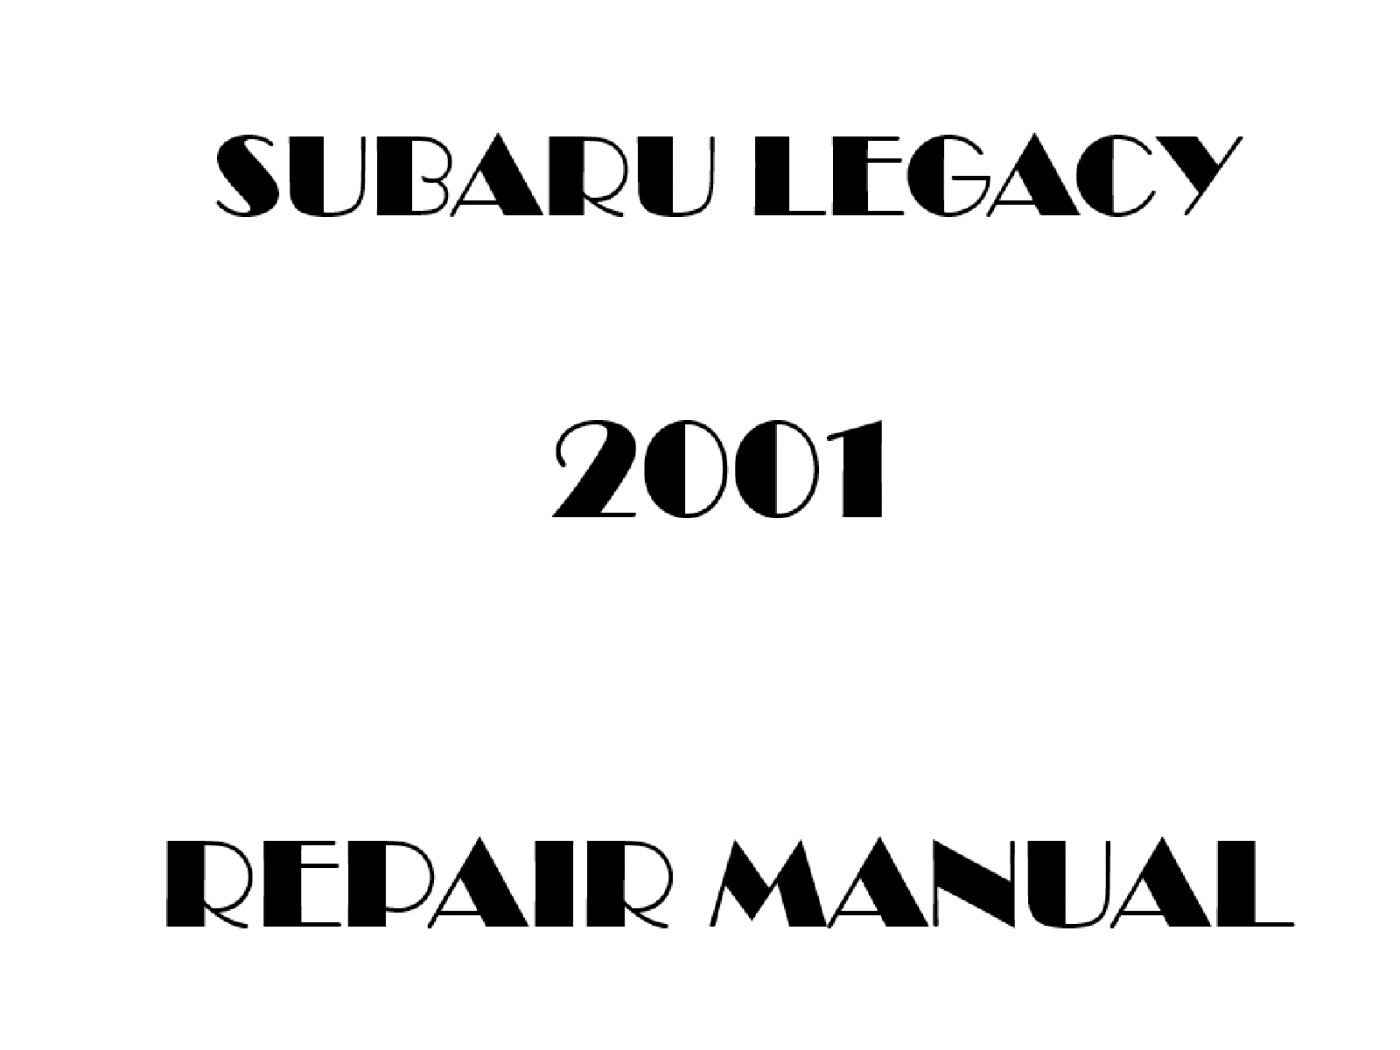 2001 Subaru Legacy repair manual